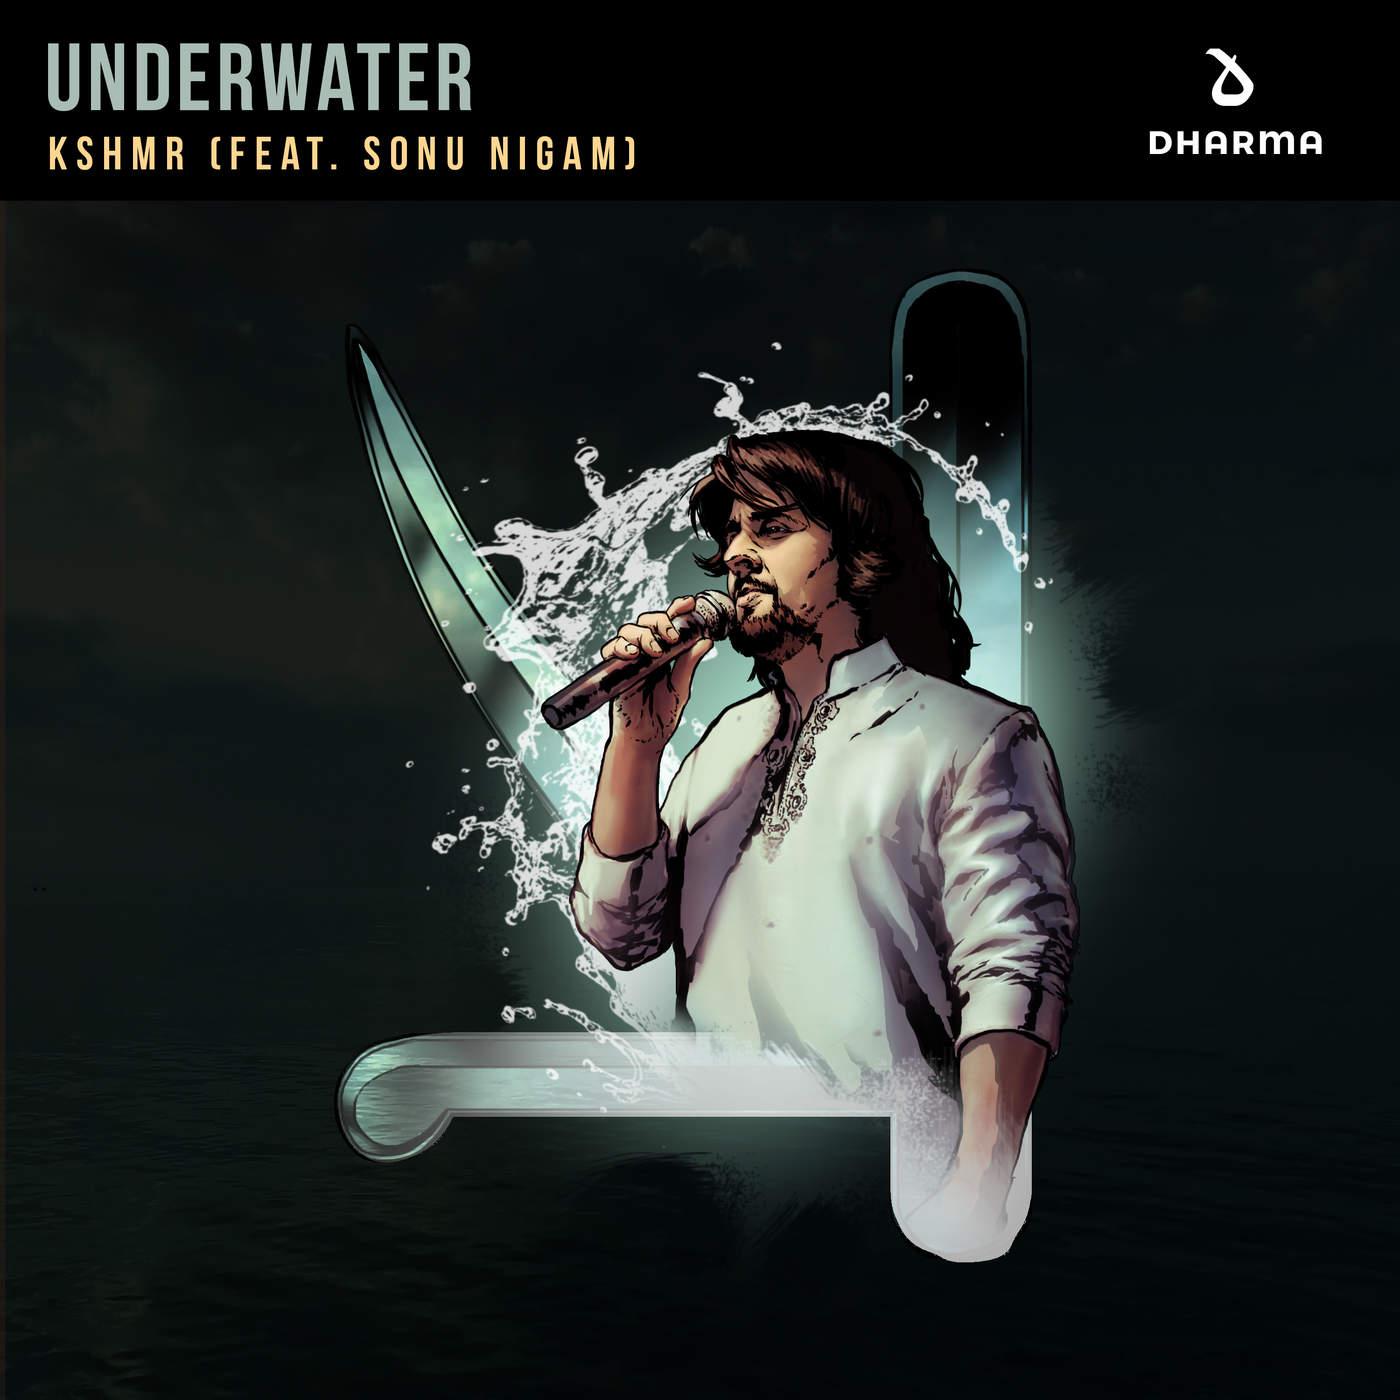 KSHMR - Underwater (feat. Sonu Nigam) - Single Cover